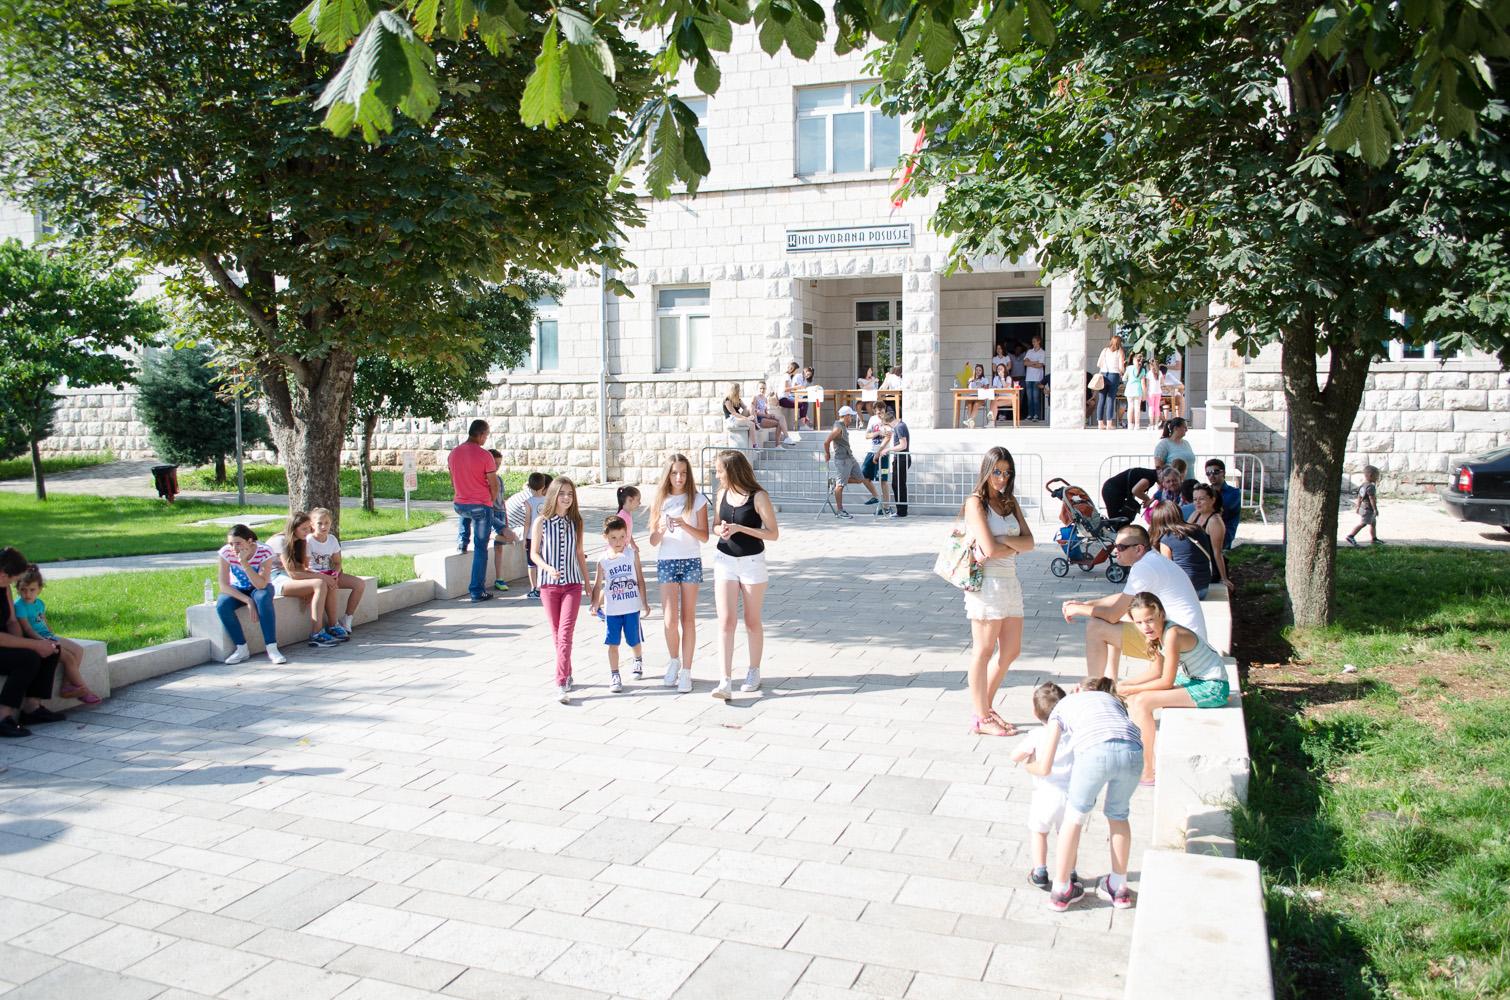 Besplatan Wi-Fi na Trgu hrvatskih branitelja